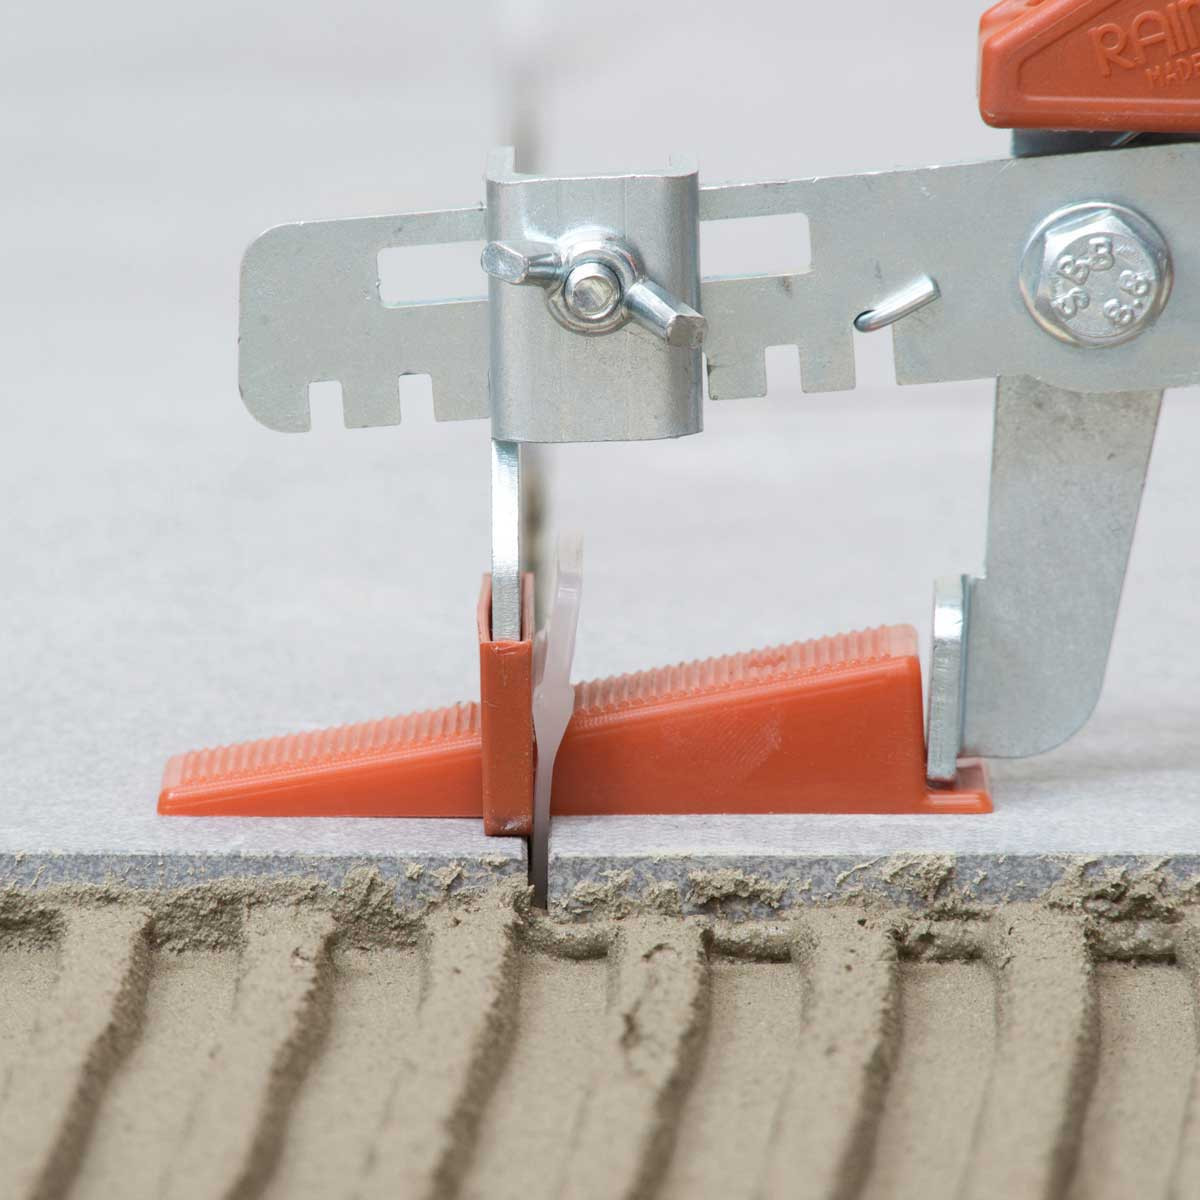 raimondi 5/32nd installing with floor pliers